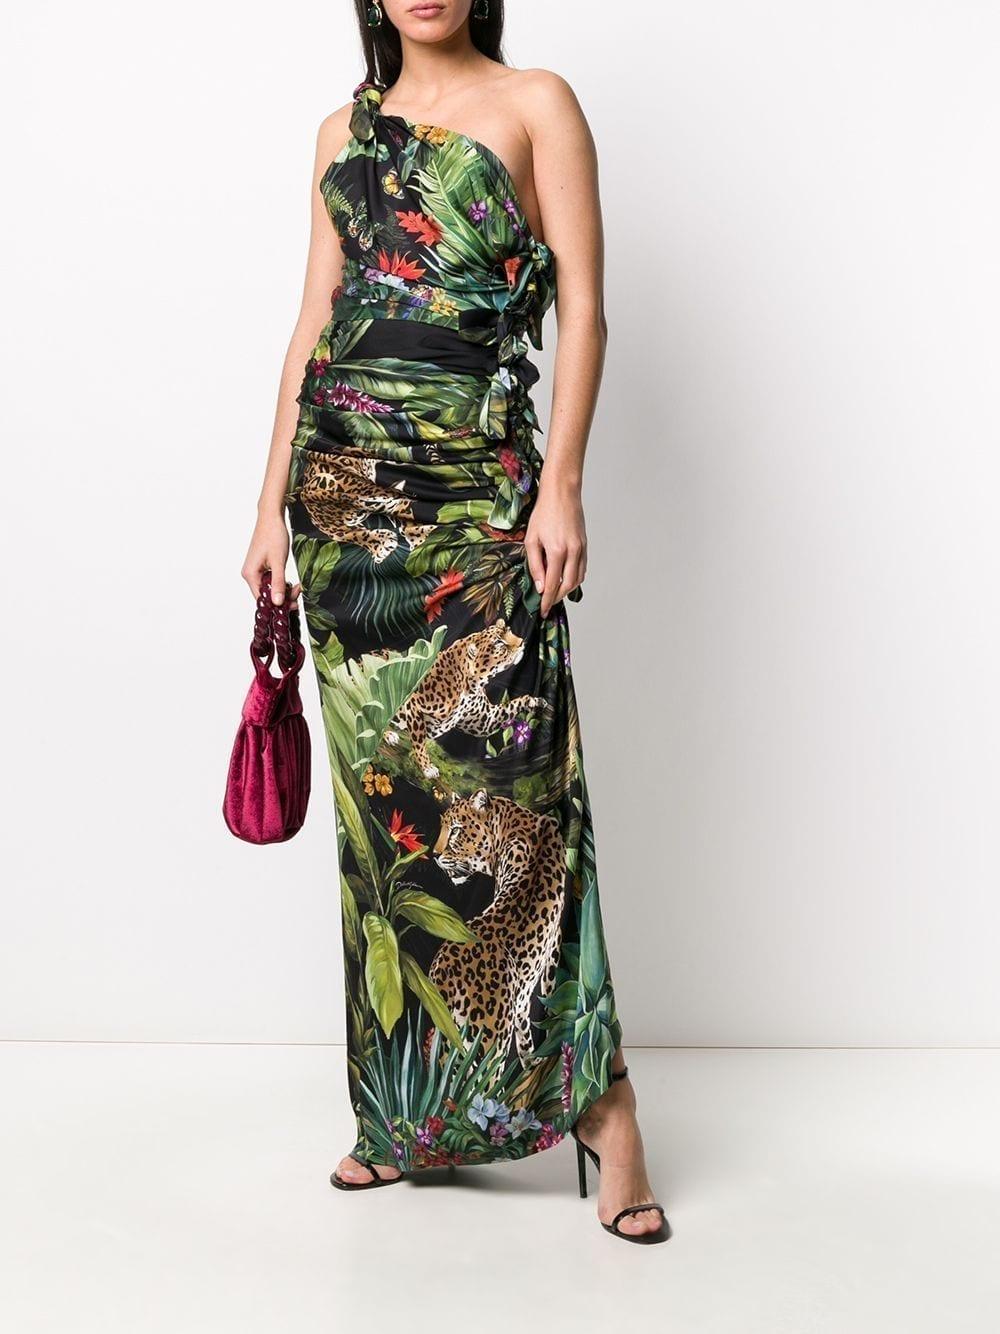 DOLCE & GABBANA Jungle Print One Shoulder Dress